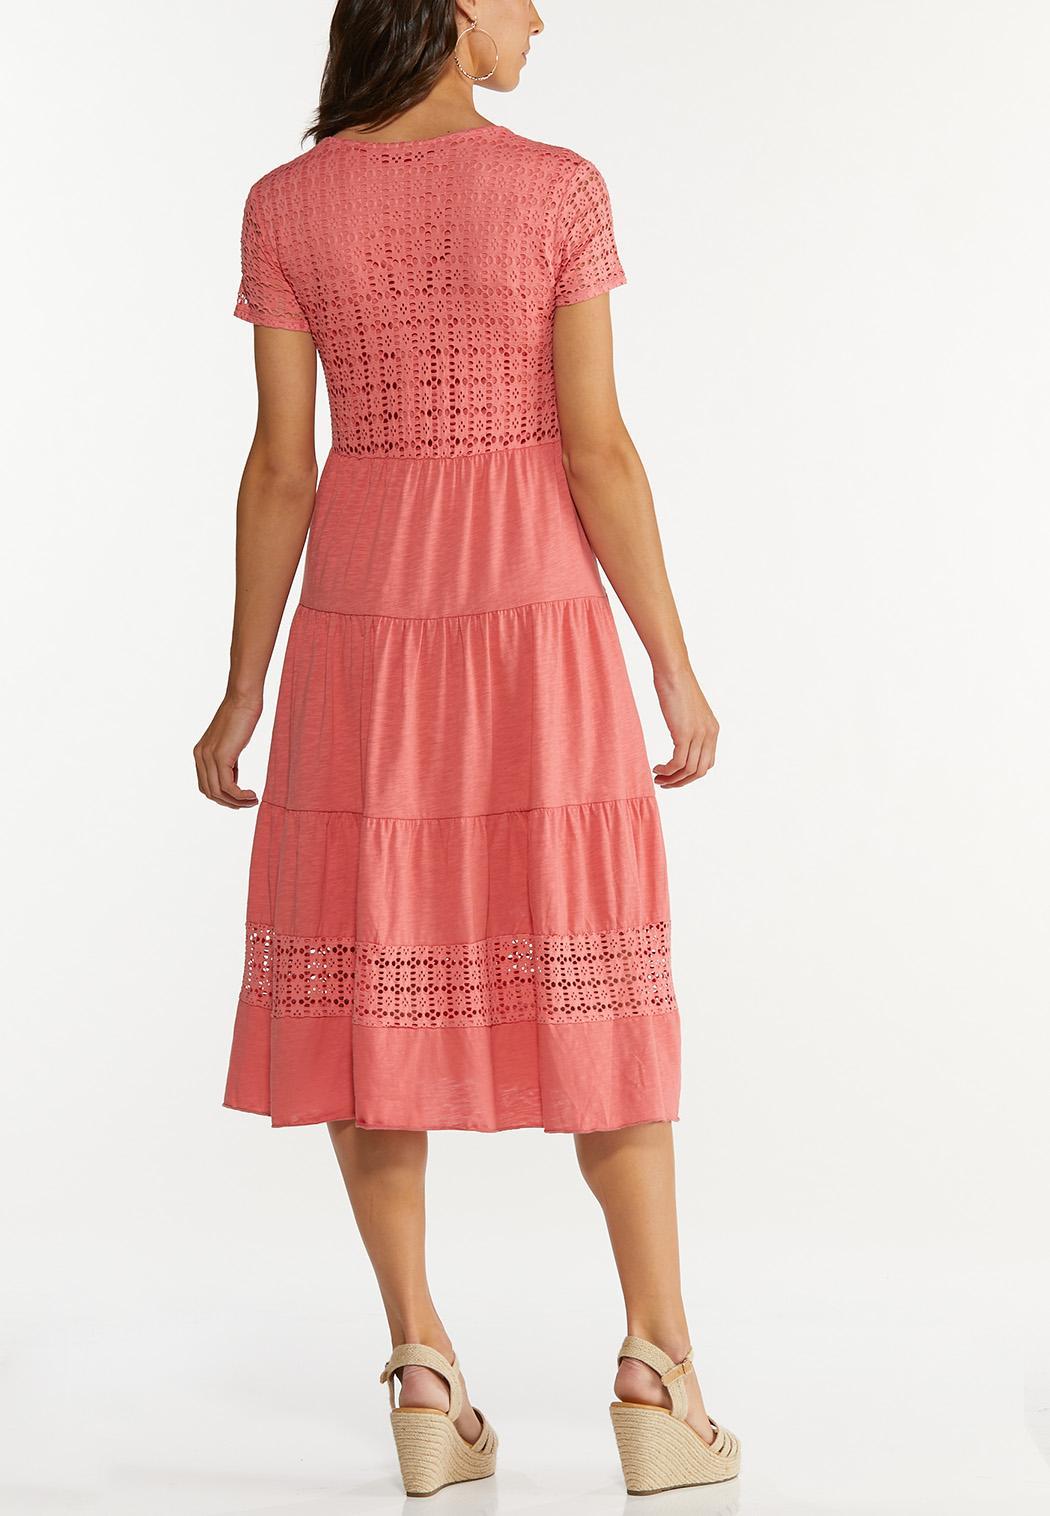 Tiered Eyelet Dress (Item #44595975)